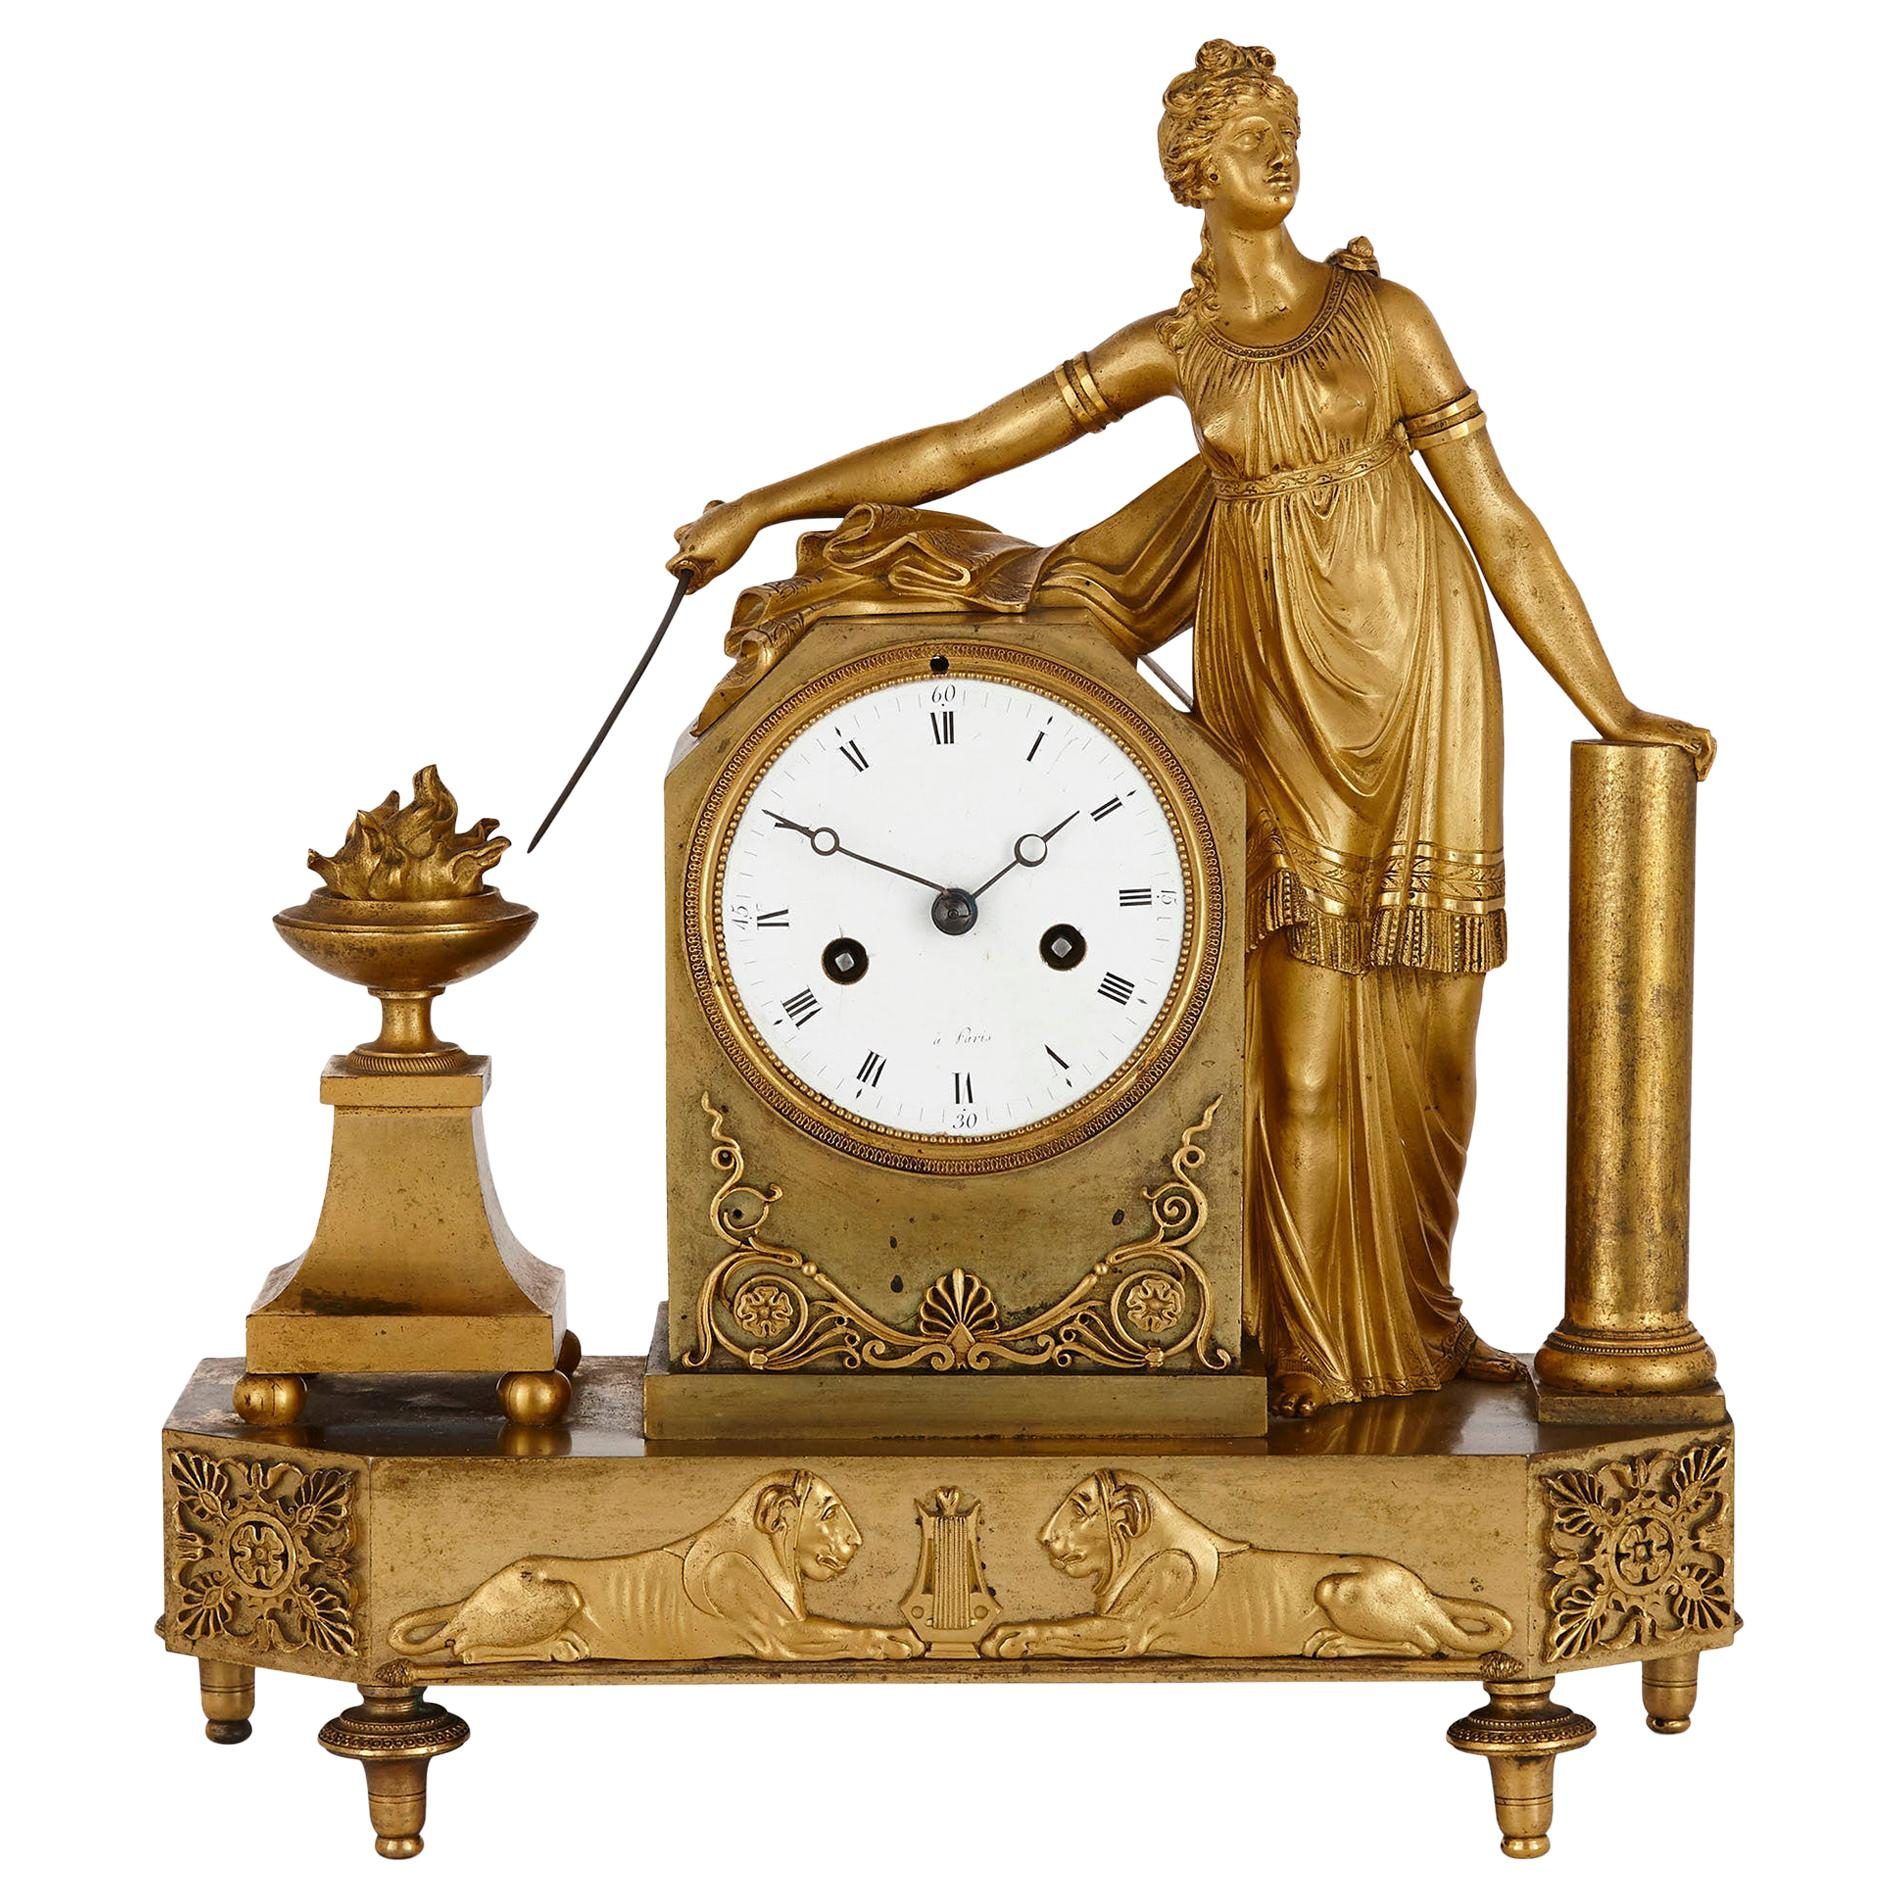 Empire Period Gilt Bronze Figurative Mantel Clock